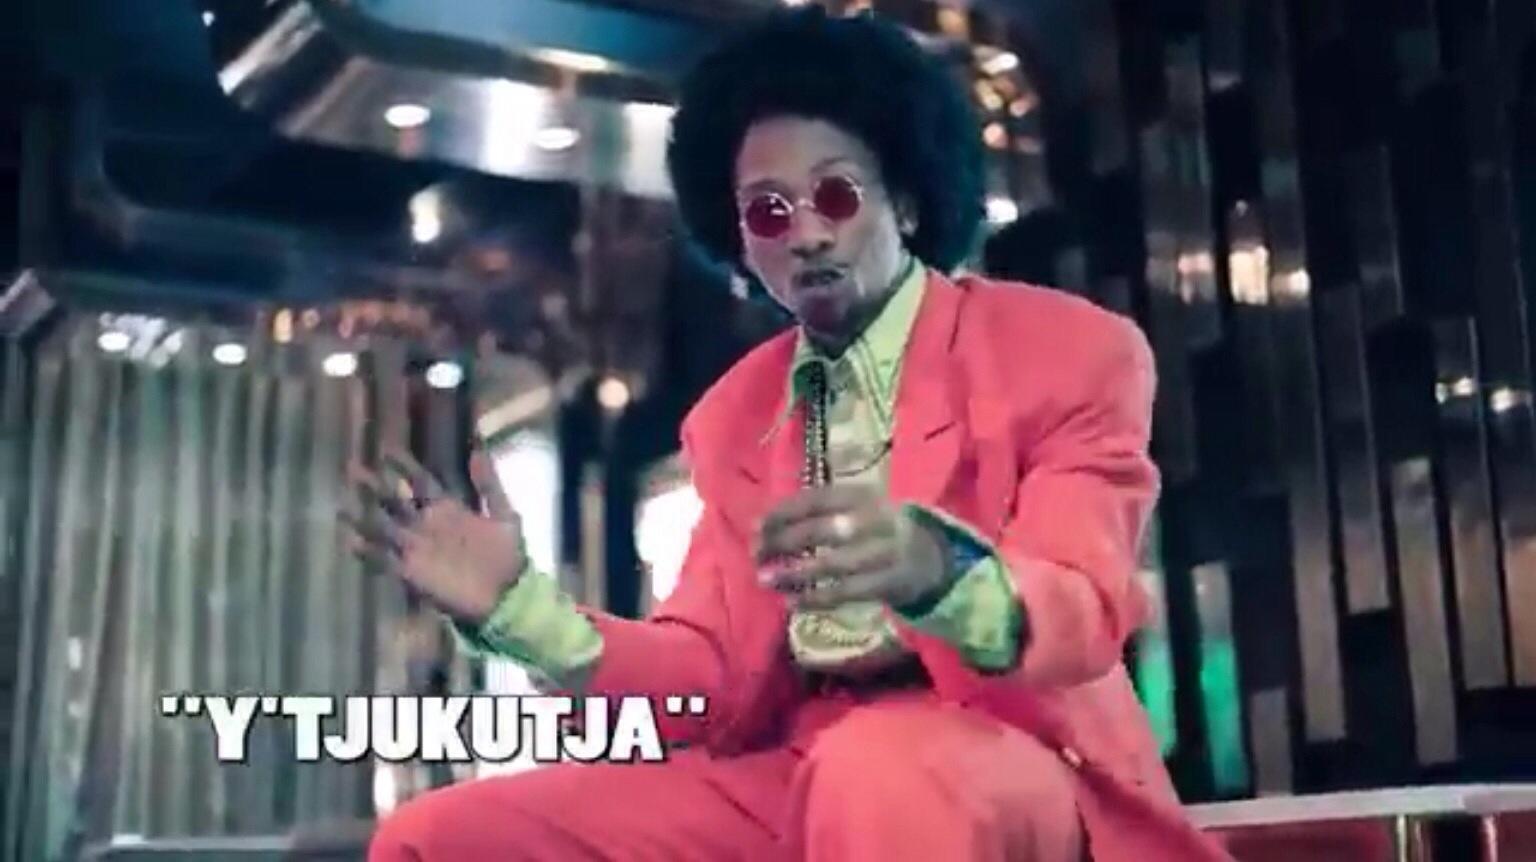 Uhuru - Y-Tjukutja ft  DJ Buckz, Oskido, Professor & Yuri Da Cunha - Mp3